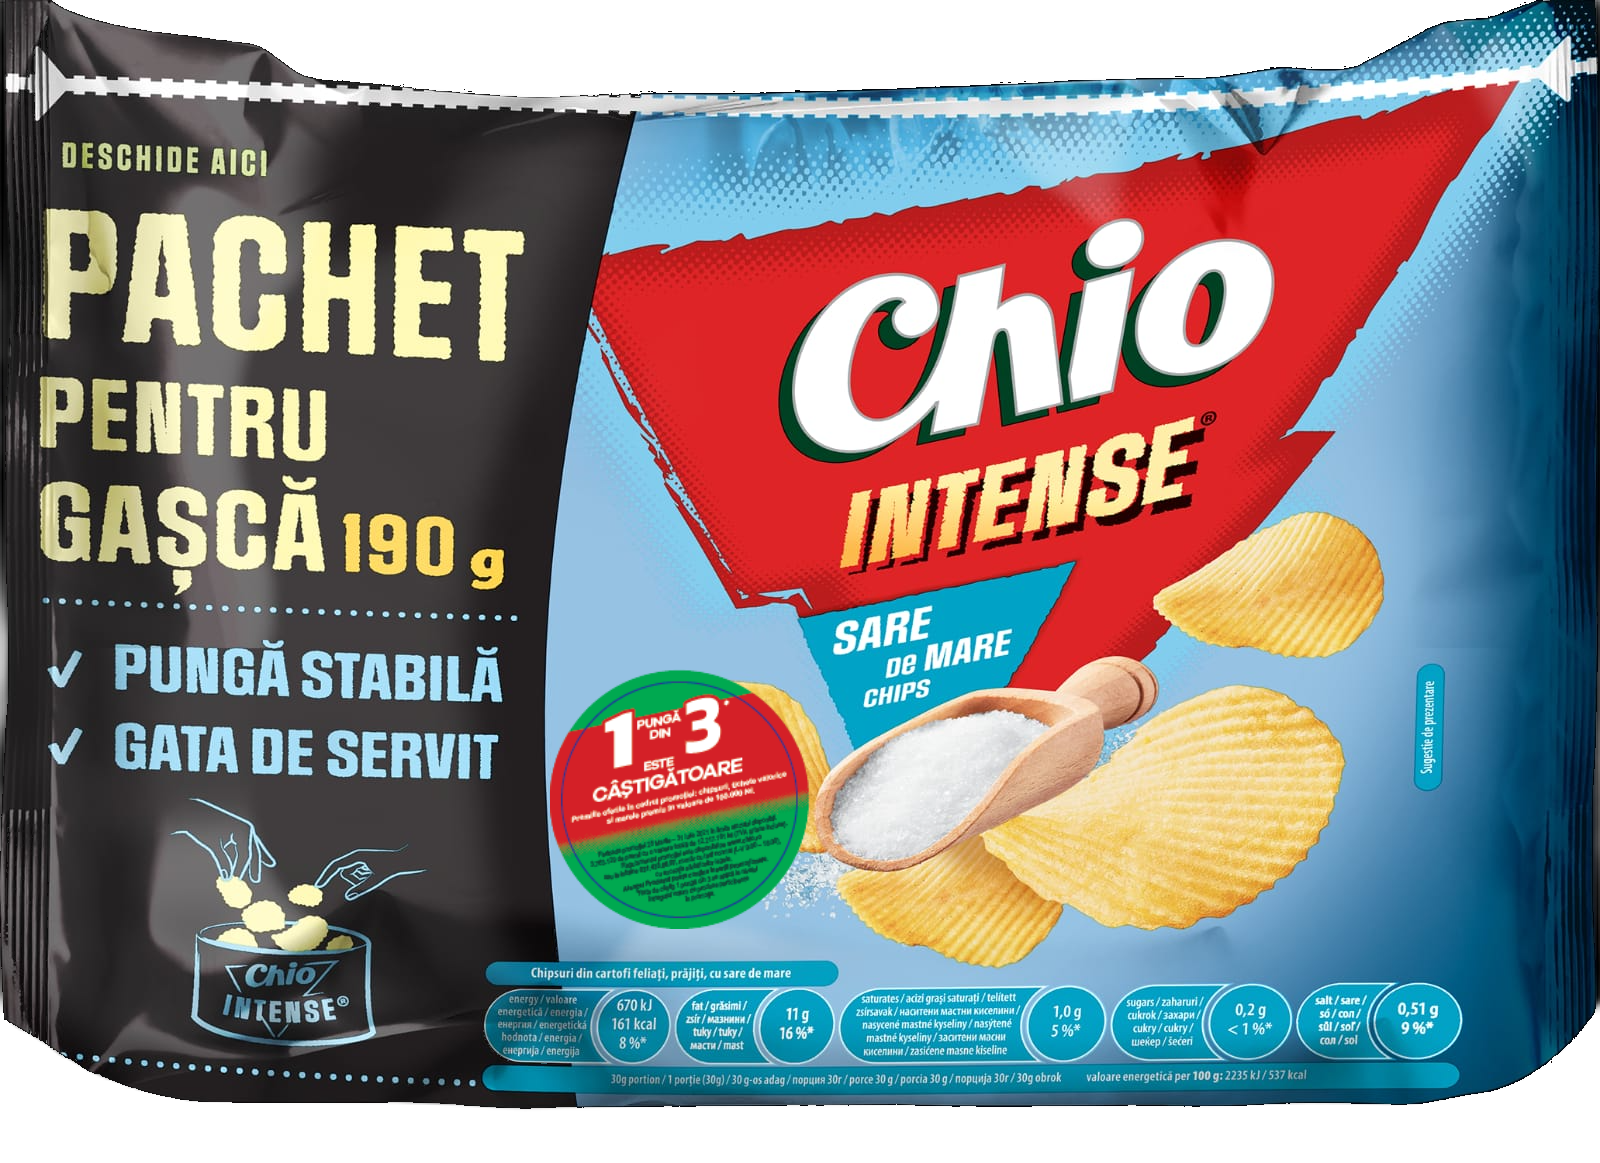 https://chio.ro/wp-content/themes/chio/1din3/Chio Chips Intense Pachet Sare de Mare?_t=1619015001